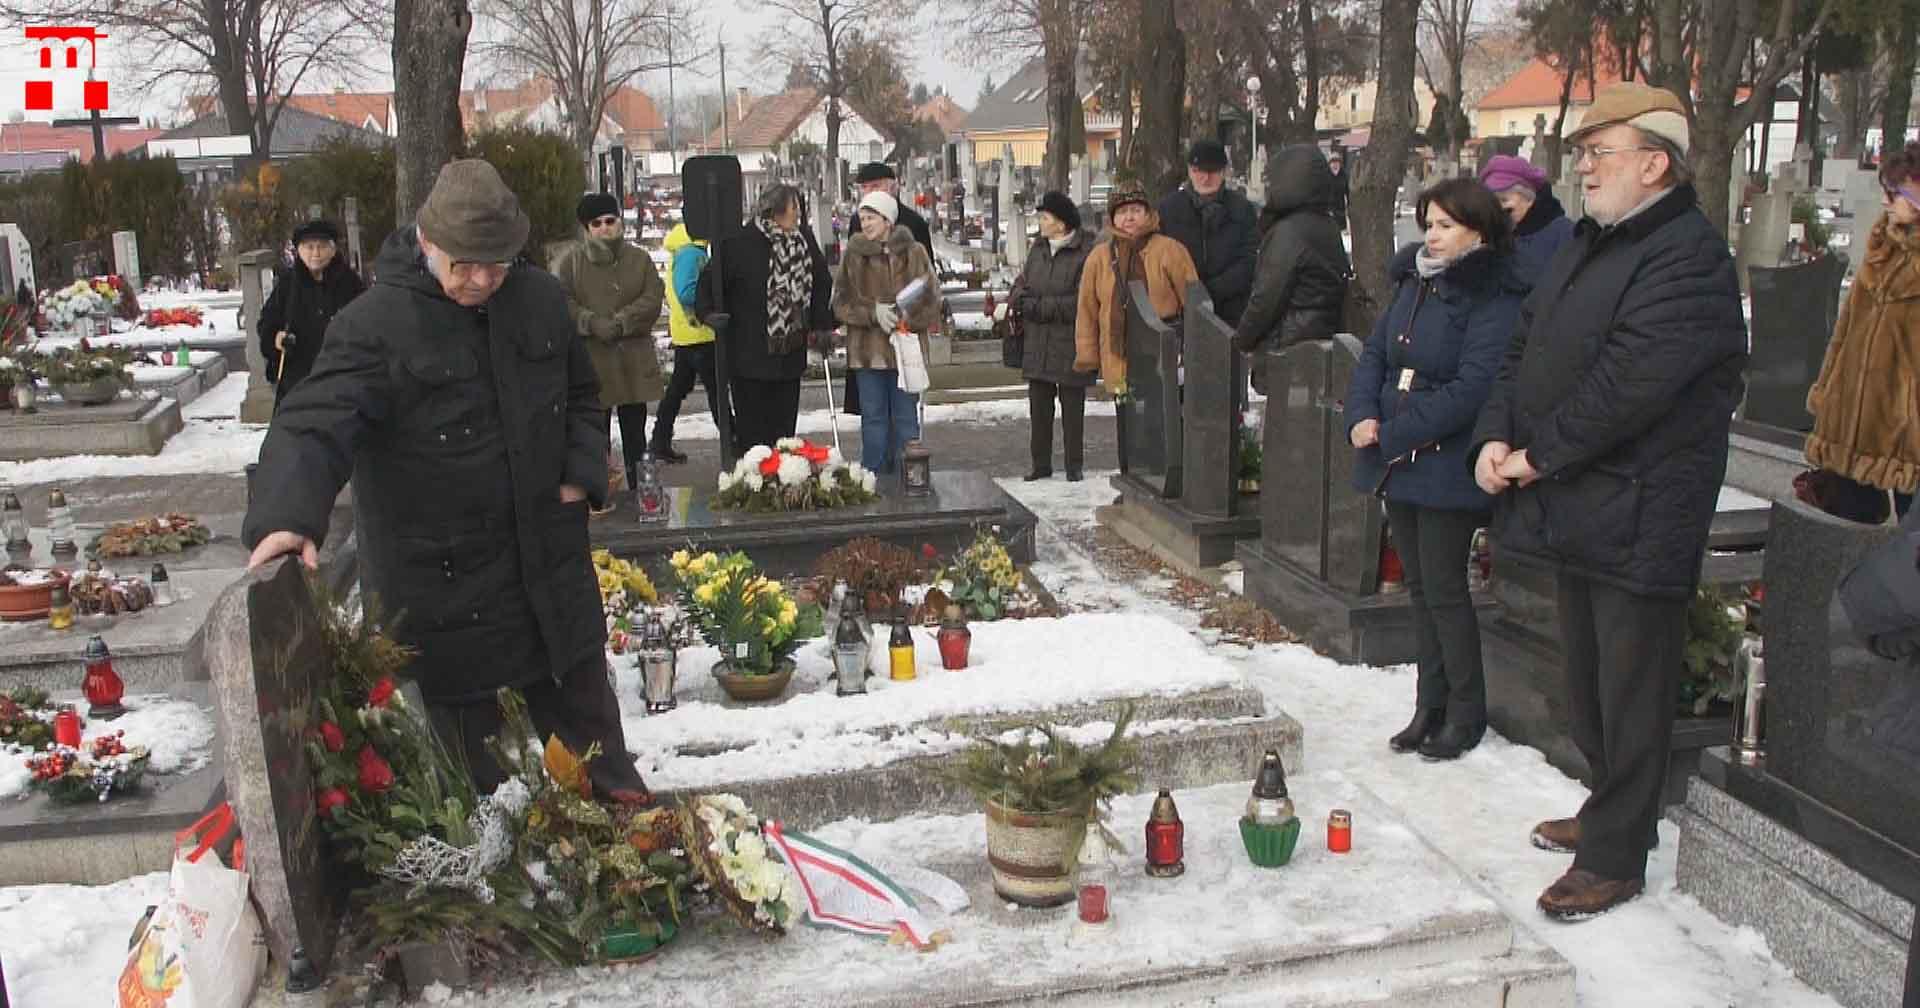 Ozsvald Árpádra emlékeztek Pozsonypüspökin